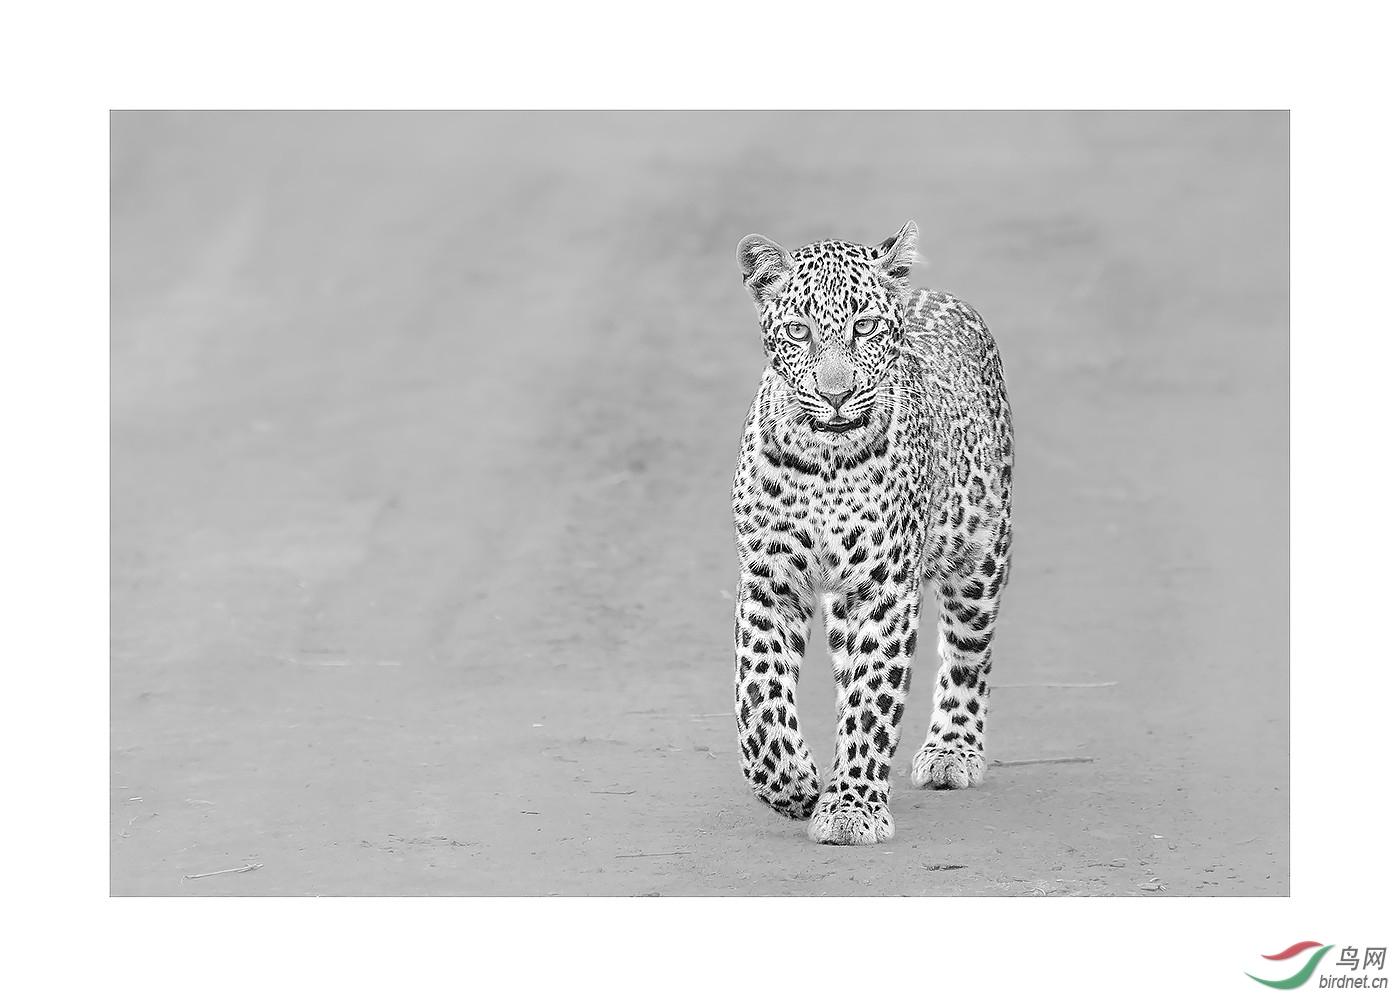 r-入围-0169.一只花豹wxy123-pic-5b8eddcfed12d.jpg